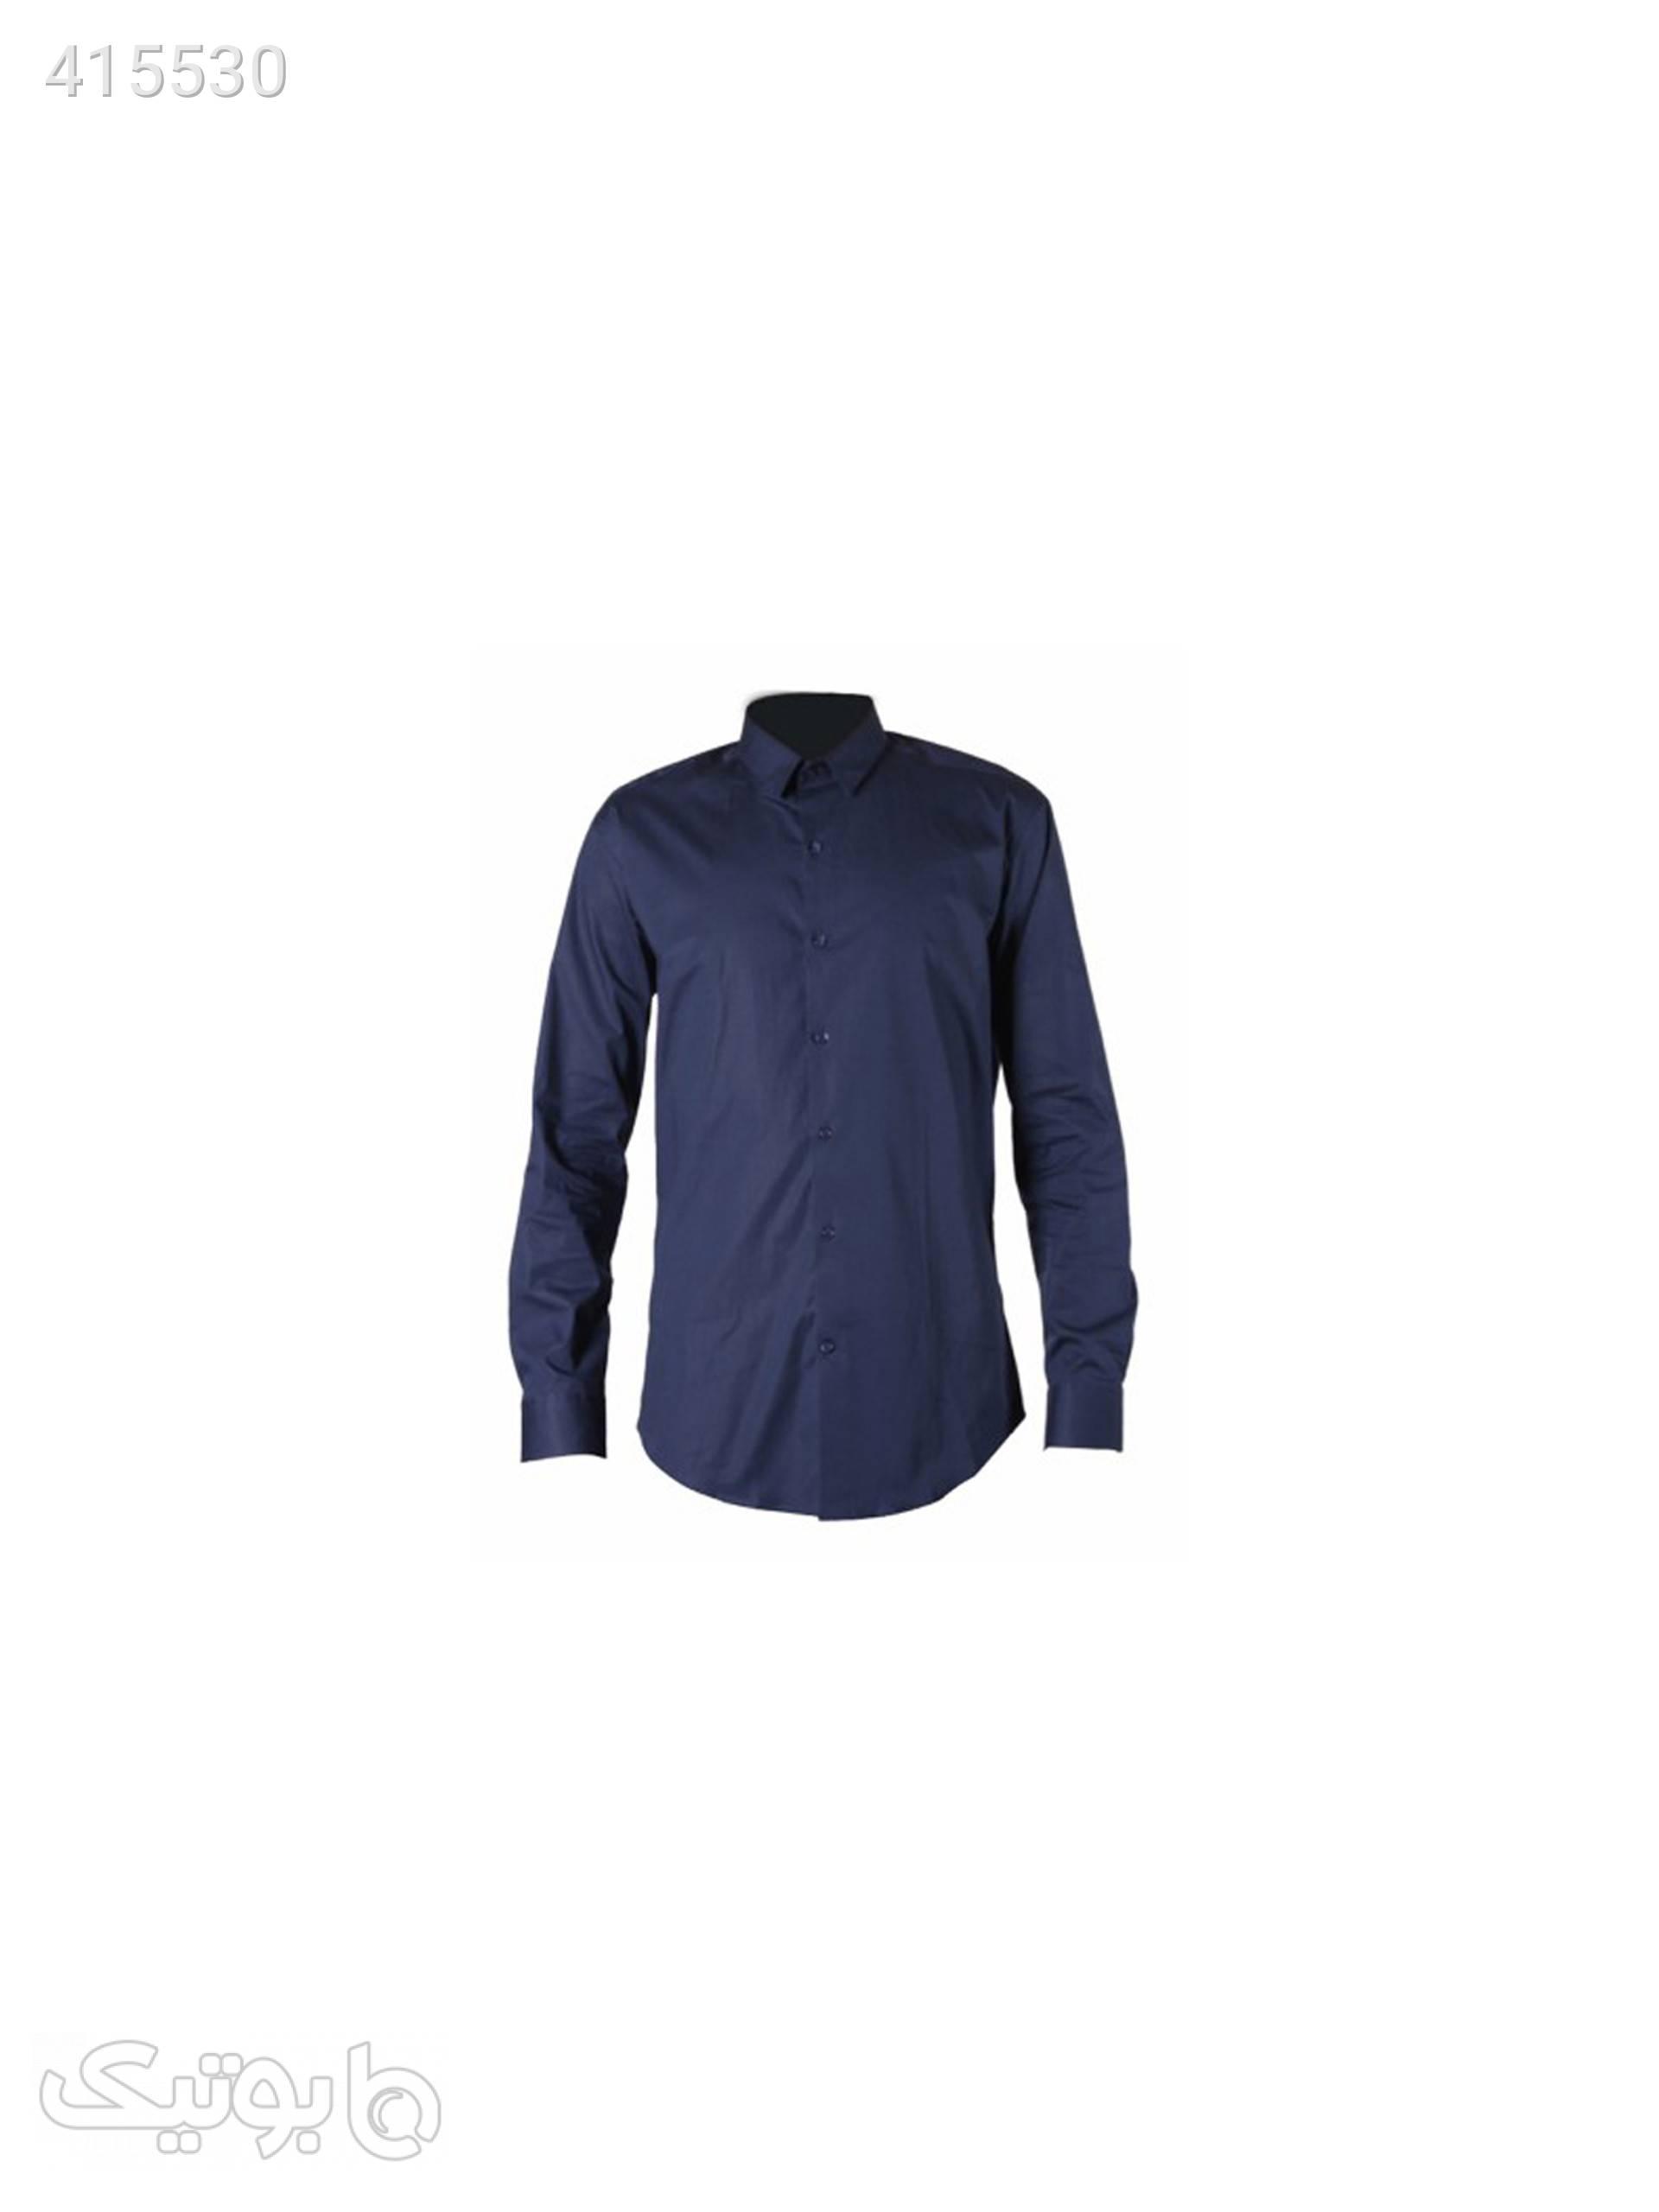 پیراهن مردانه پوپلین سرمه ای سورمه ای پيراهن مردانه